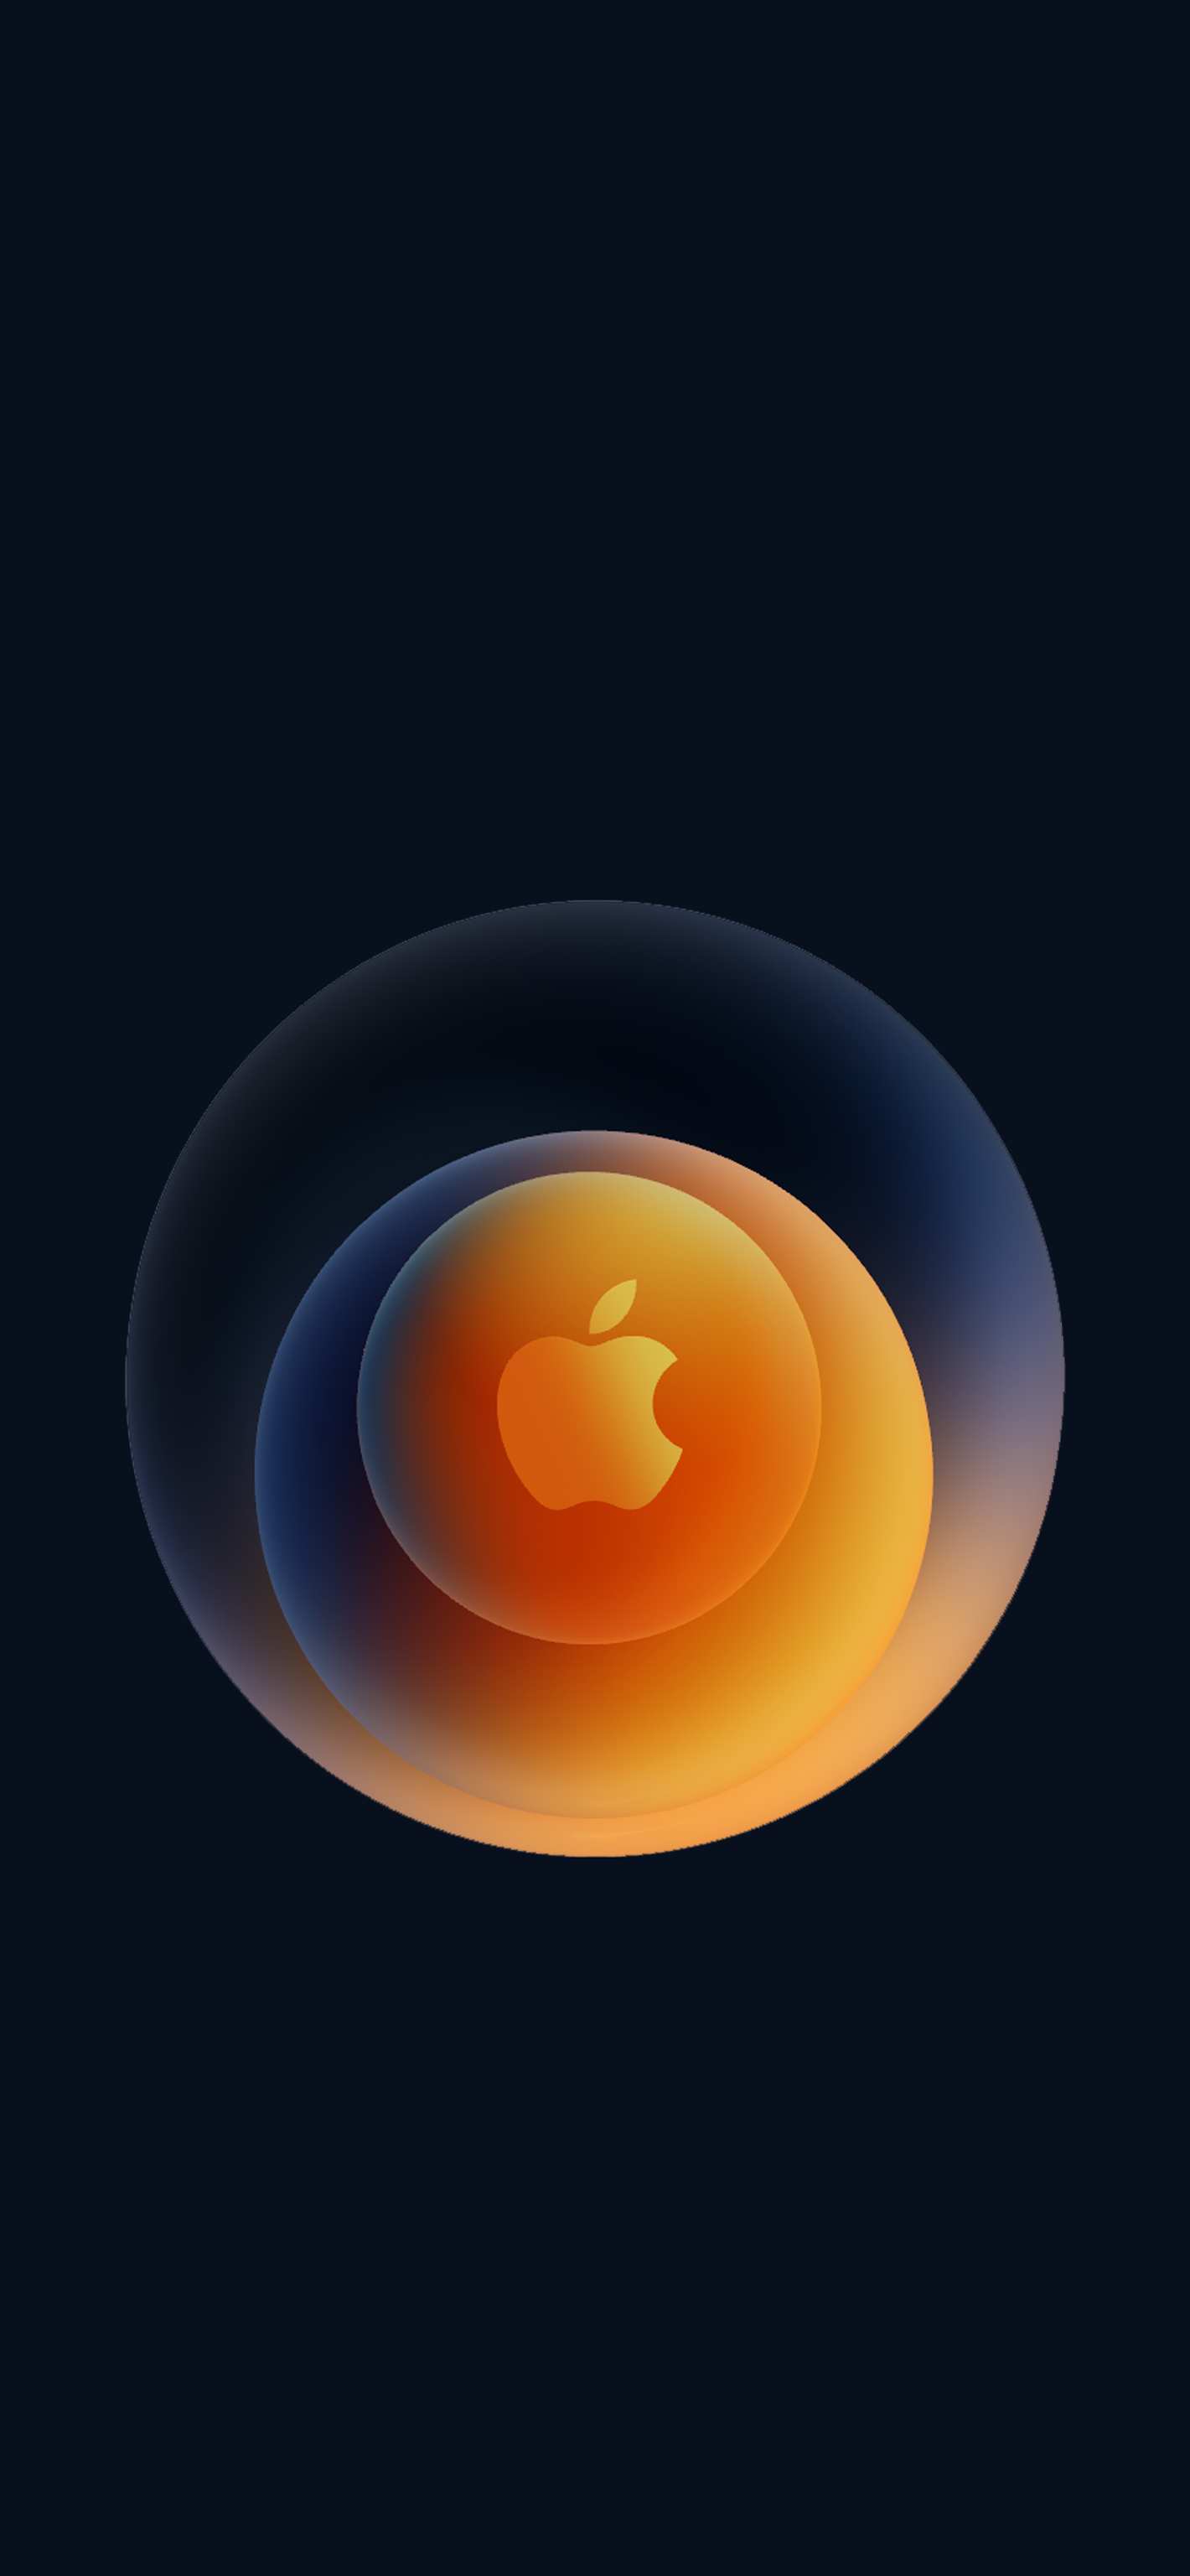 Iphone Wallpaper Apple Iphone Wallpaper Hd Iphone Wallpaper Ios Apple Wallpaper Iphone